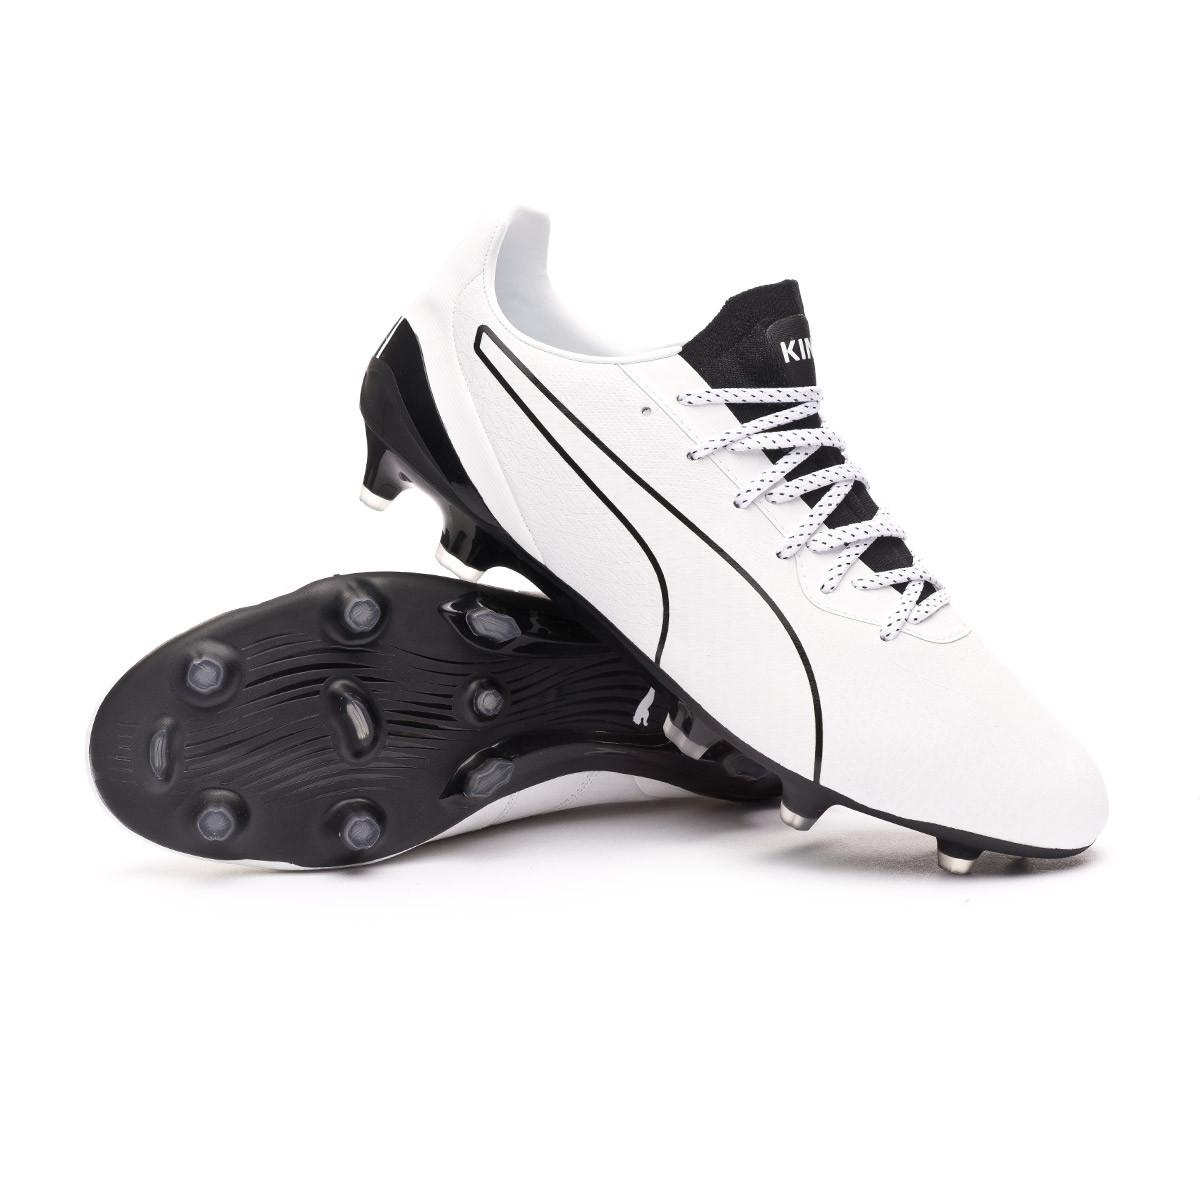 Puma King Platinum Lazertouch FG/AG Football Boots